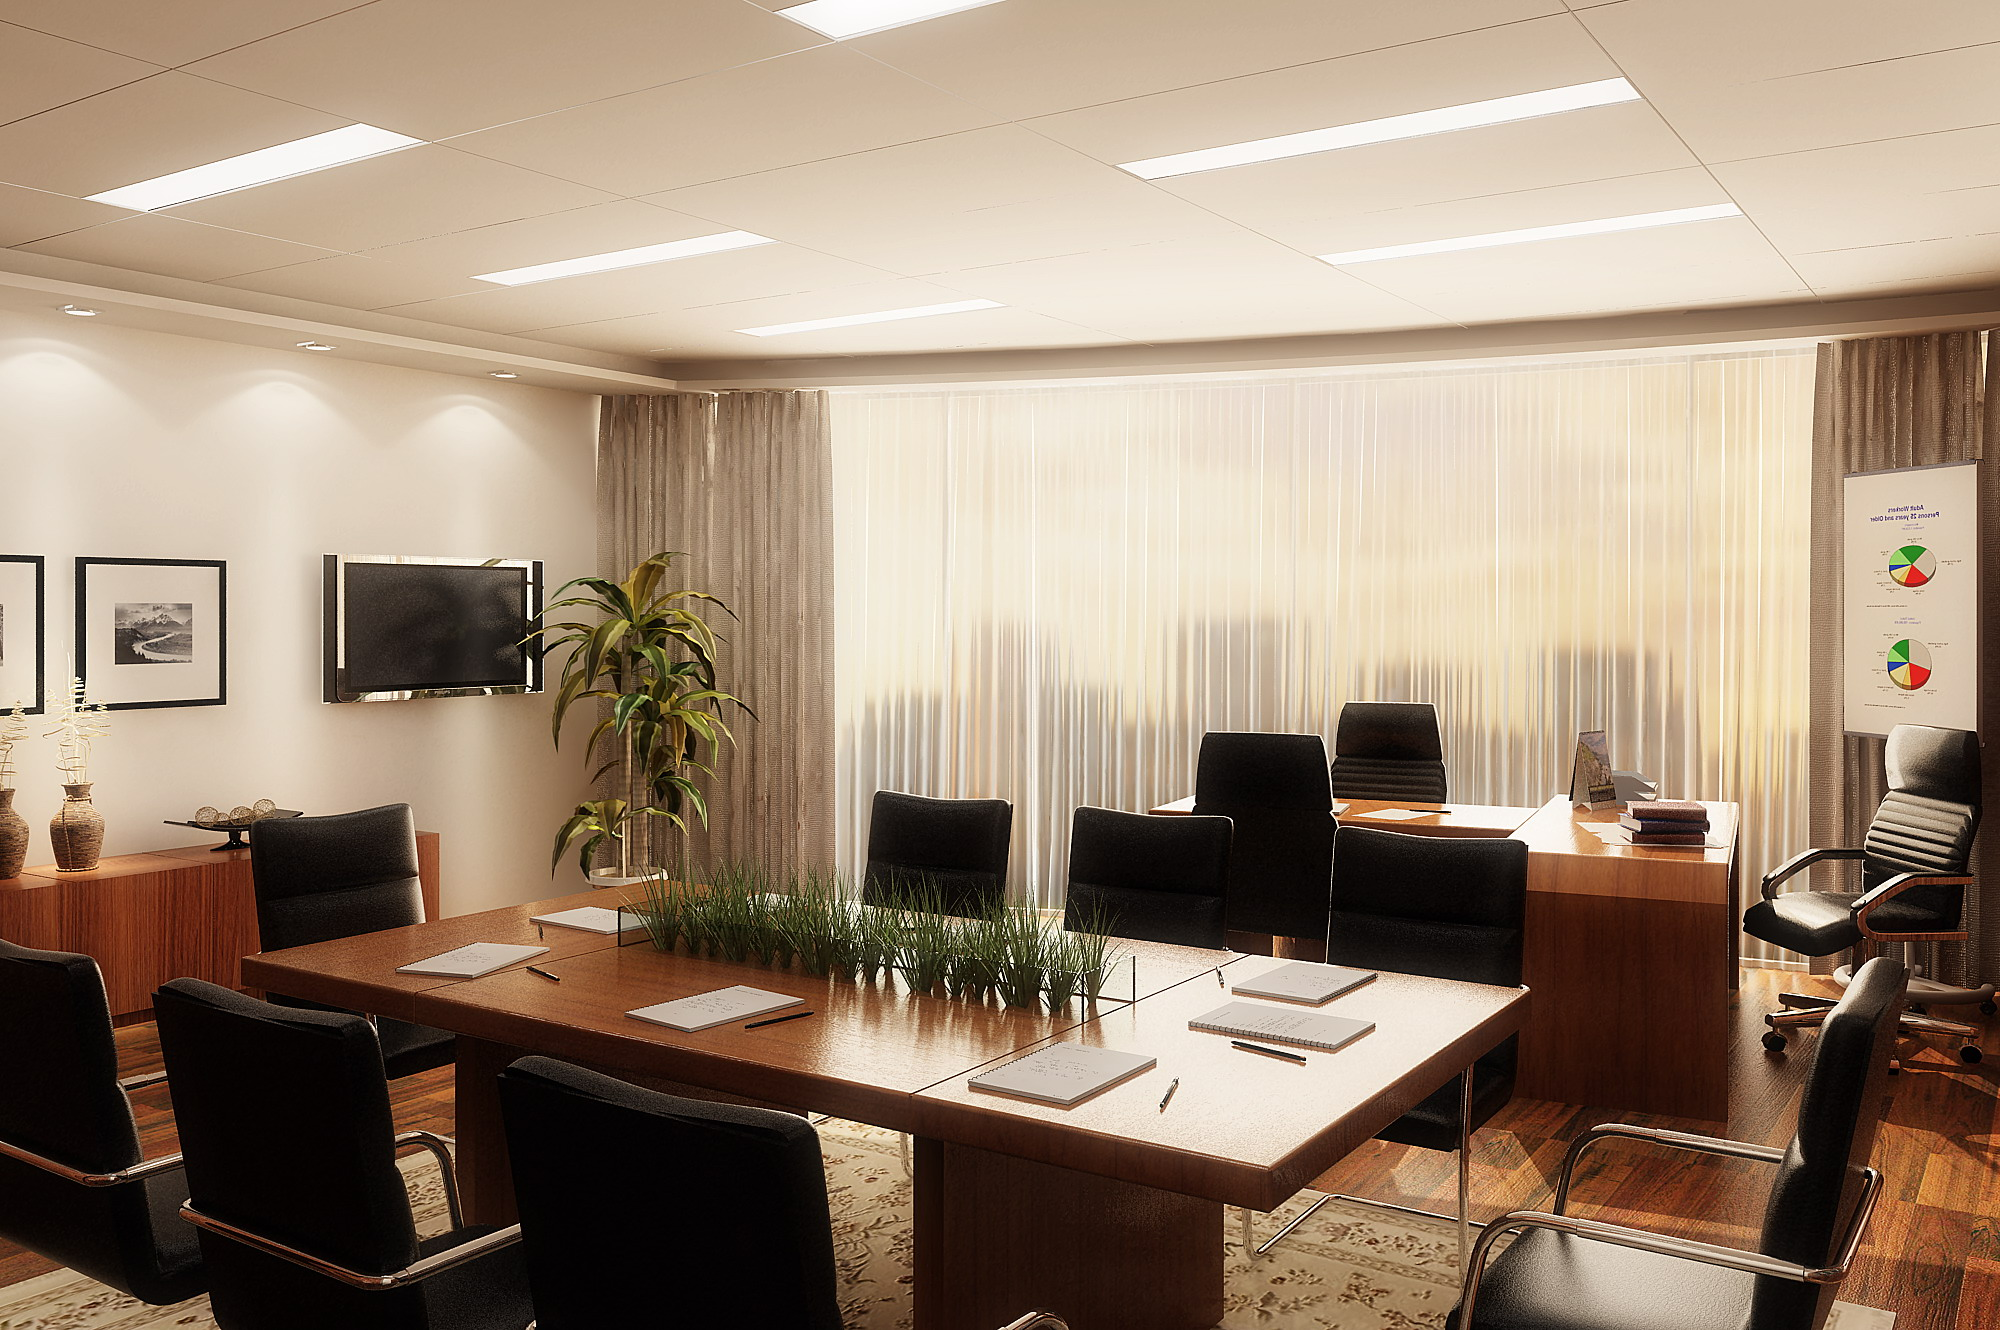 office 014 64446kb jpg by guam_work - Office Models Photos